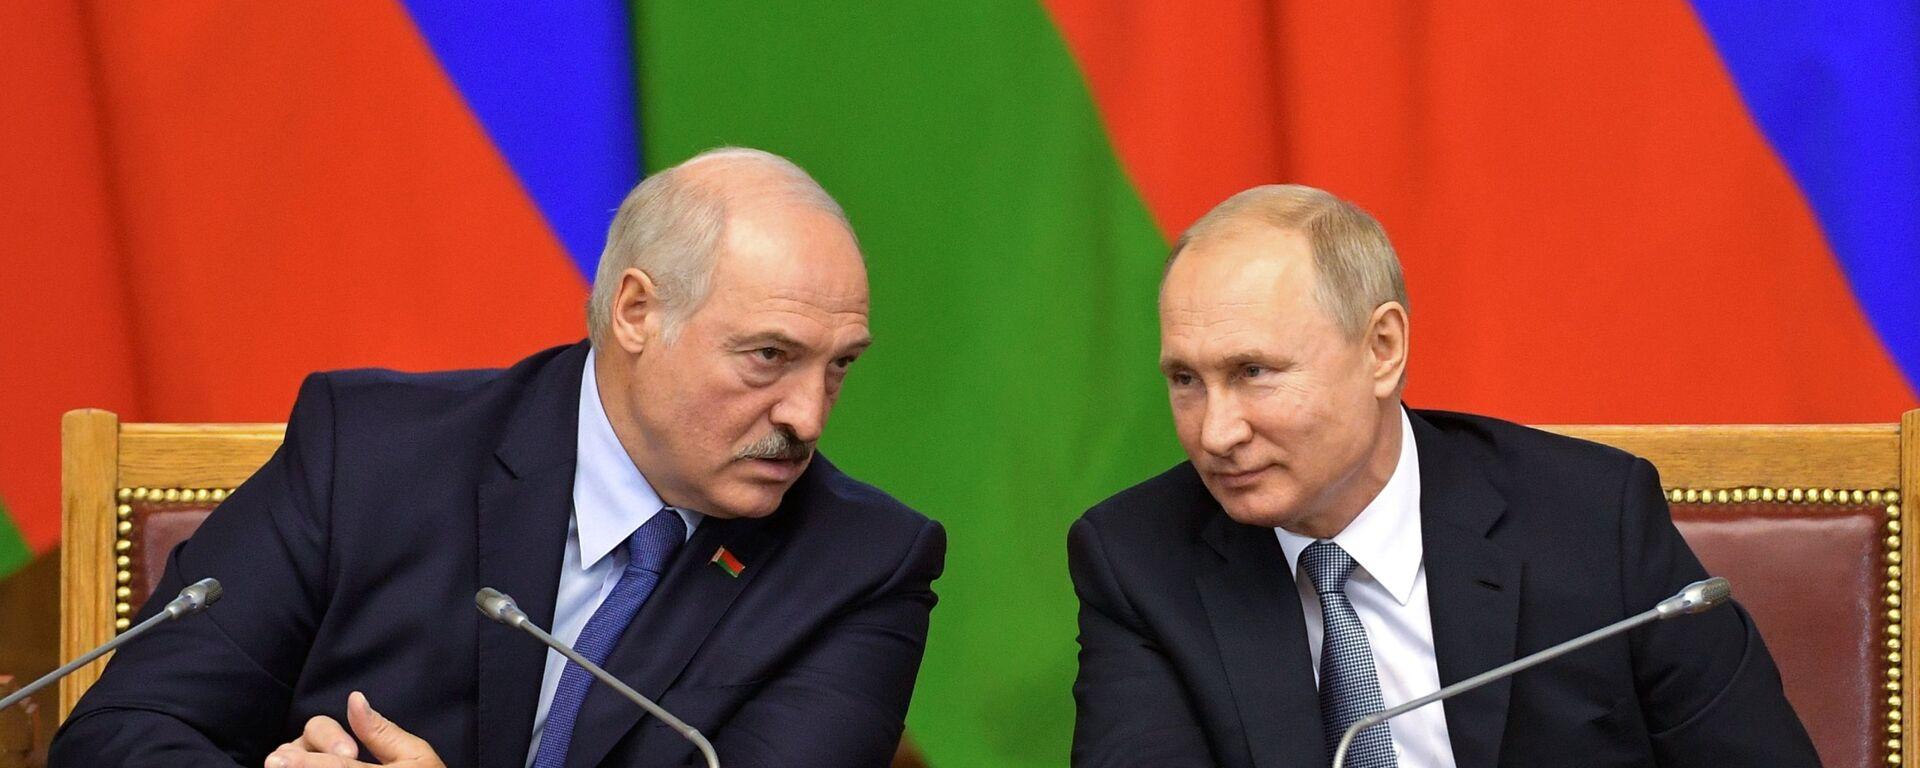 El presidente de Bielorrusia, Alexandr Lukashenko, y el presidente de Rusia, Vladímir Putin - Sputnik Mundo, 1920, 09.09.2021